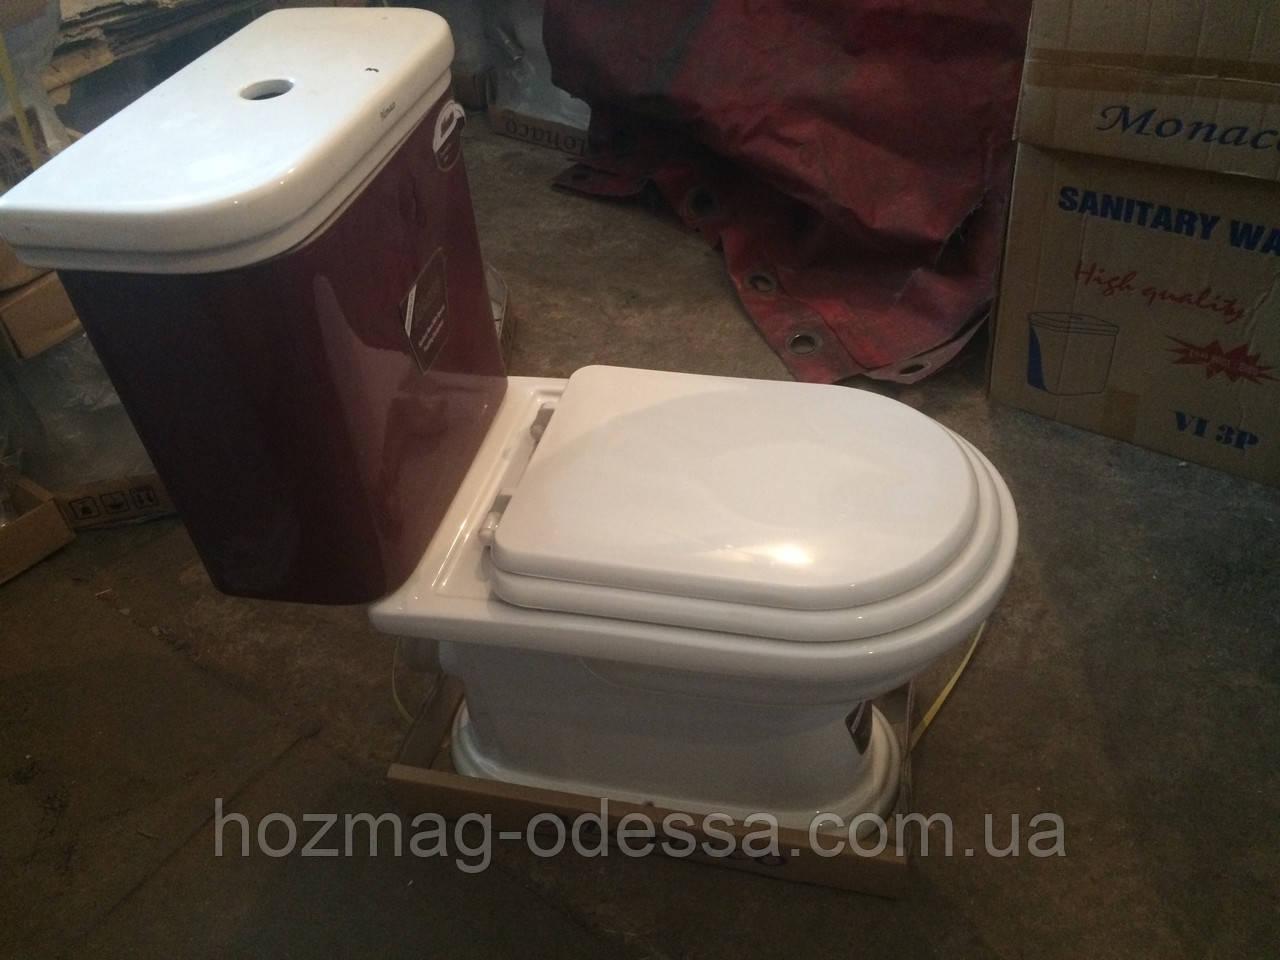 Унитаз монако купить киев 21 век сантехника волгоград на тулака